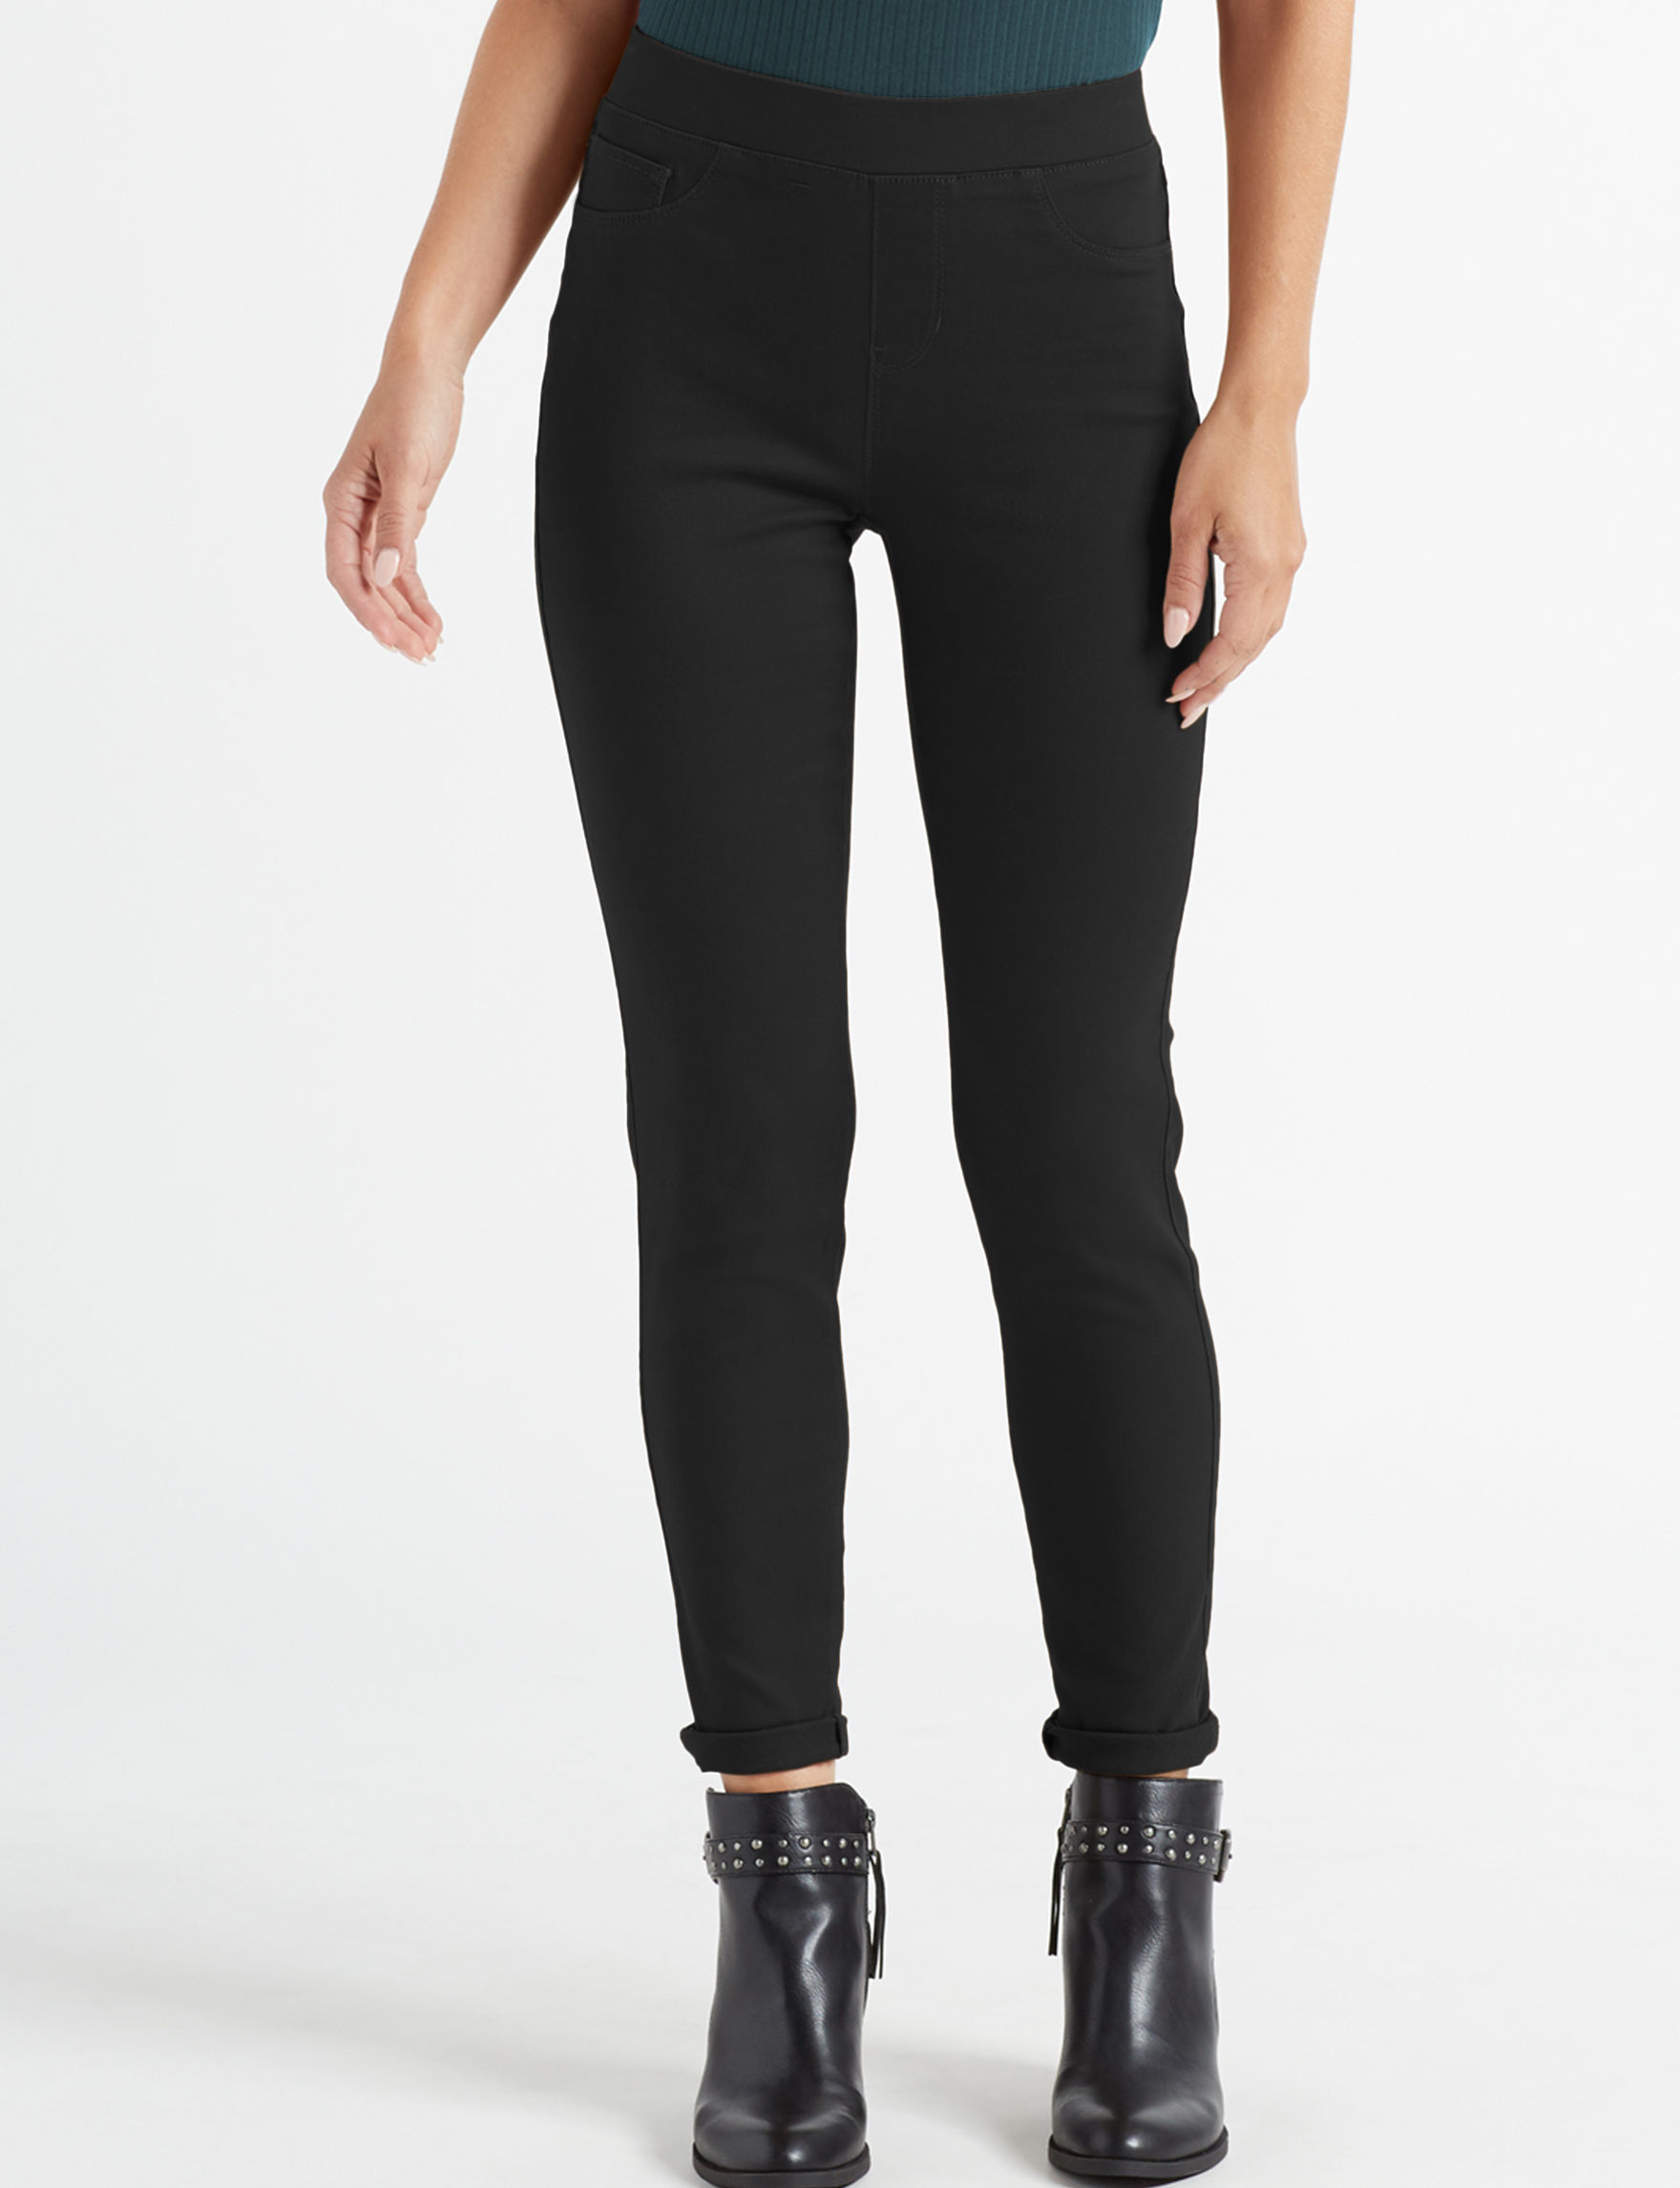 Sound Style Black Leggings